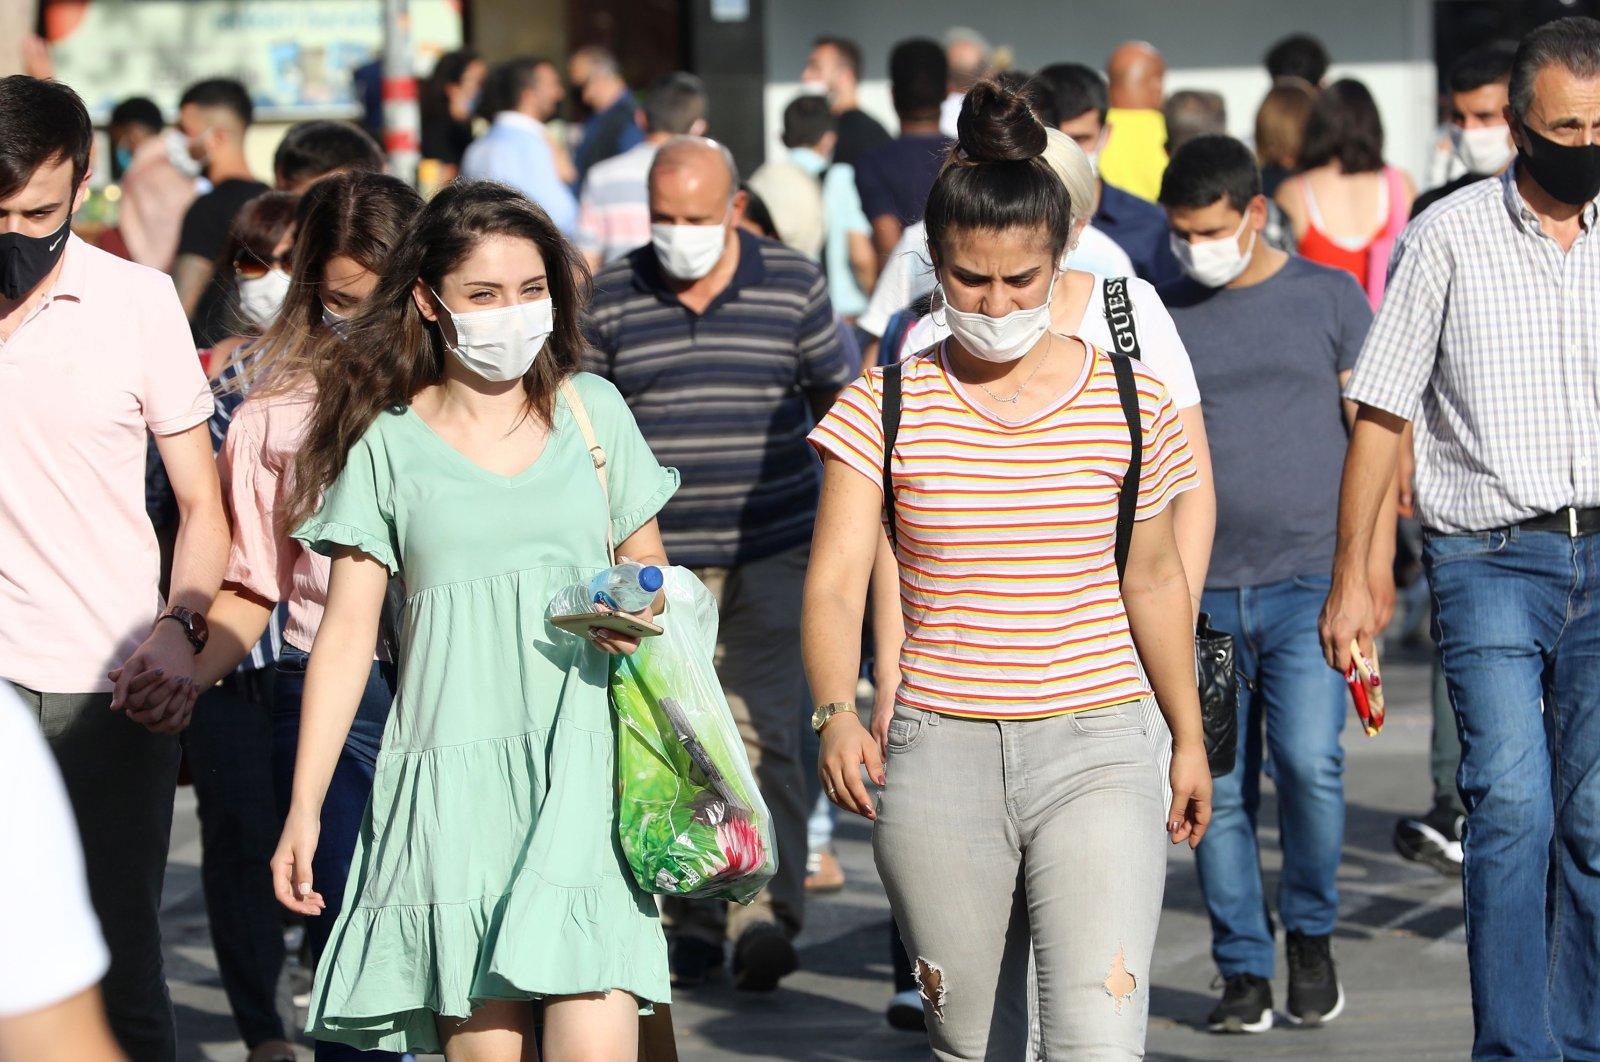 People wearing face masks walk along a street in the capital Ankara, Turkey, Sept. 18, 2020. (AFP Photo)